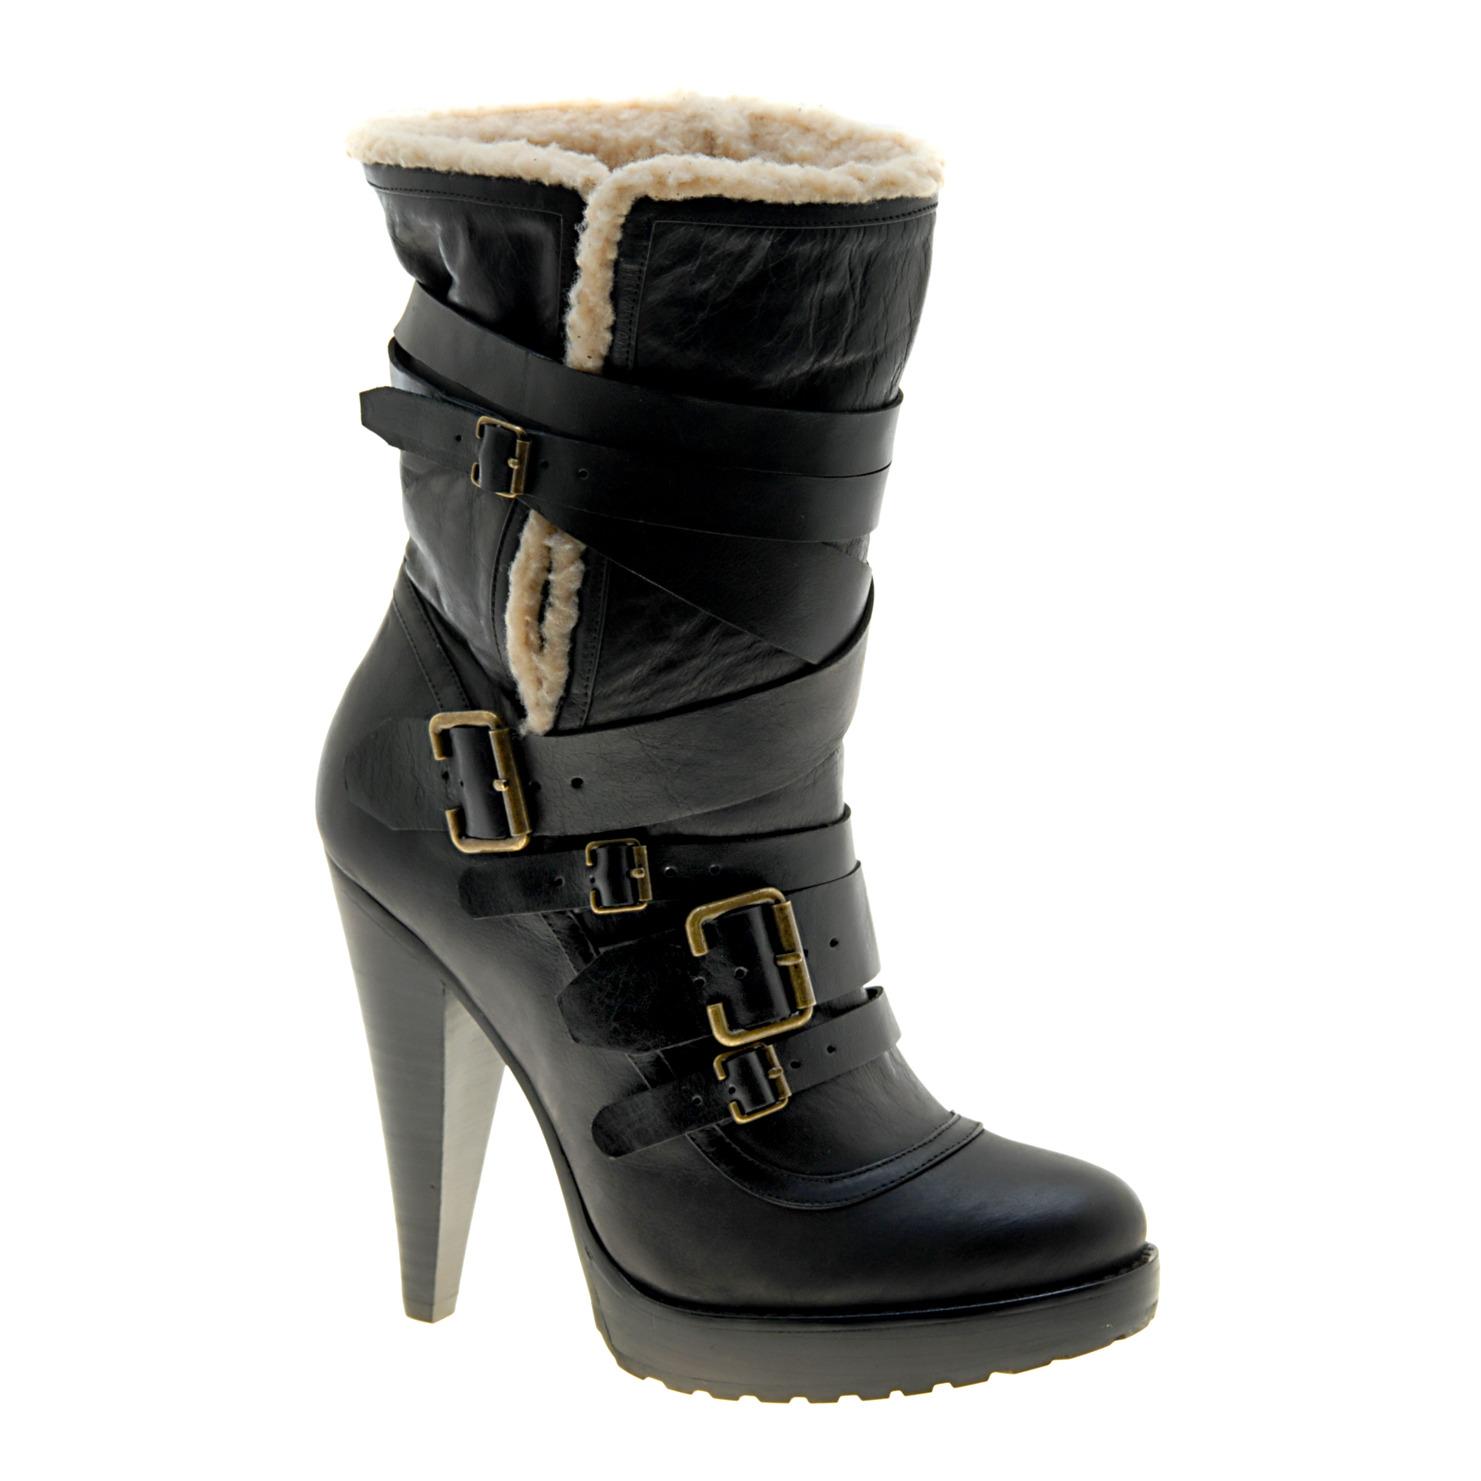 Aldo Boots ~ Mens Gladiator Sandals